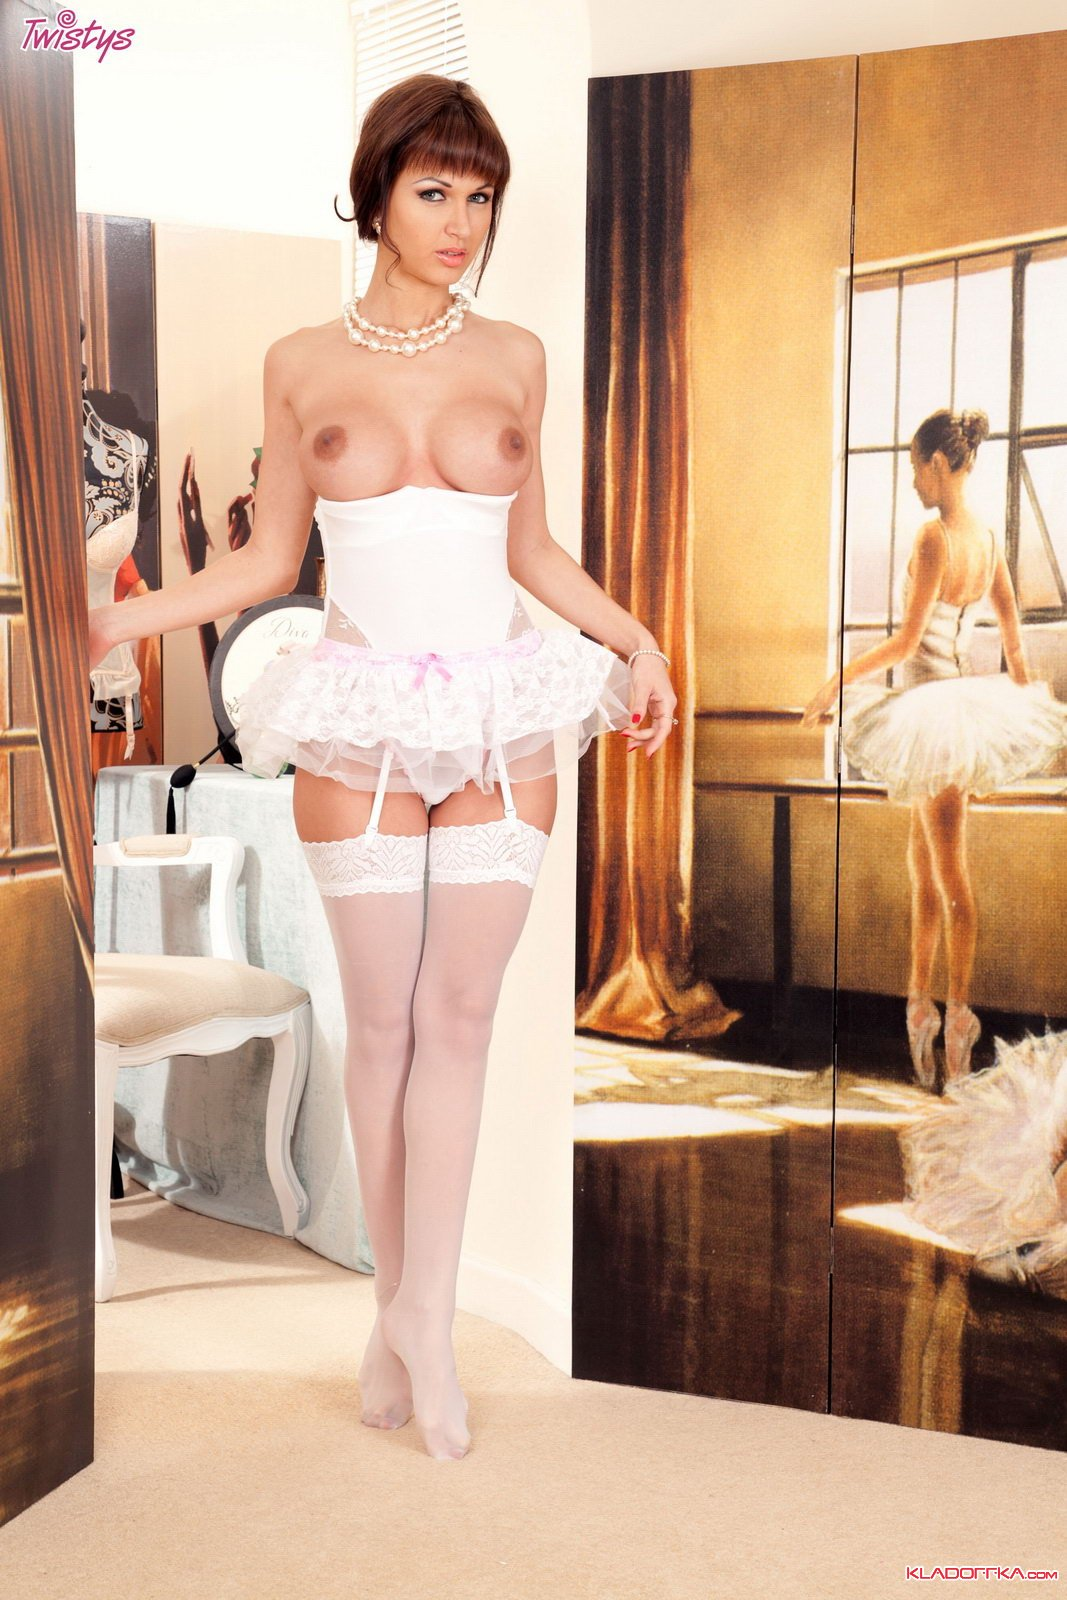 Roxanne milana порно фото